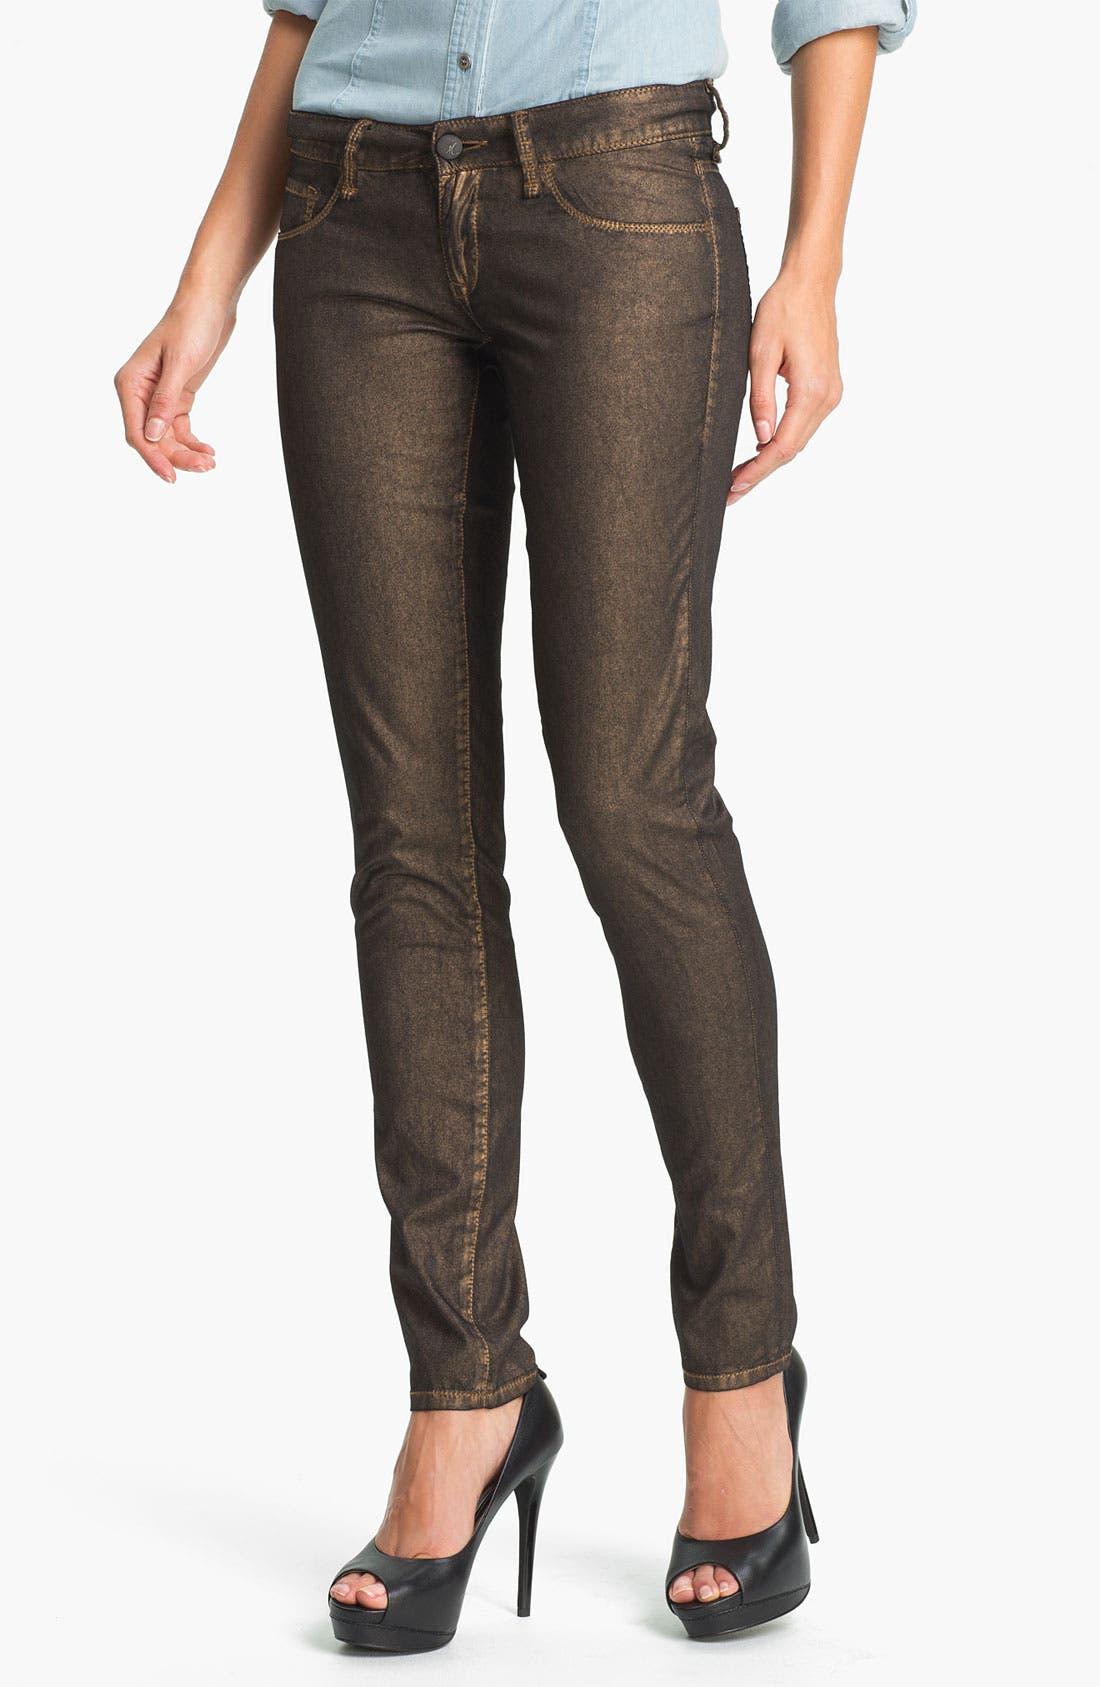 Alternate Image 1 Selected - Mavi Jeans 'Serena' Metallic Coated Skinny Jeans (Online Exclusive)